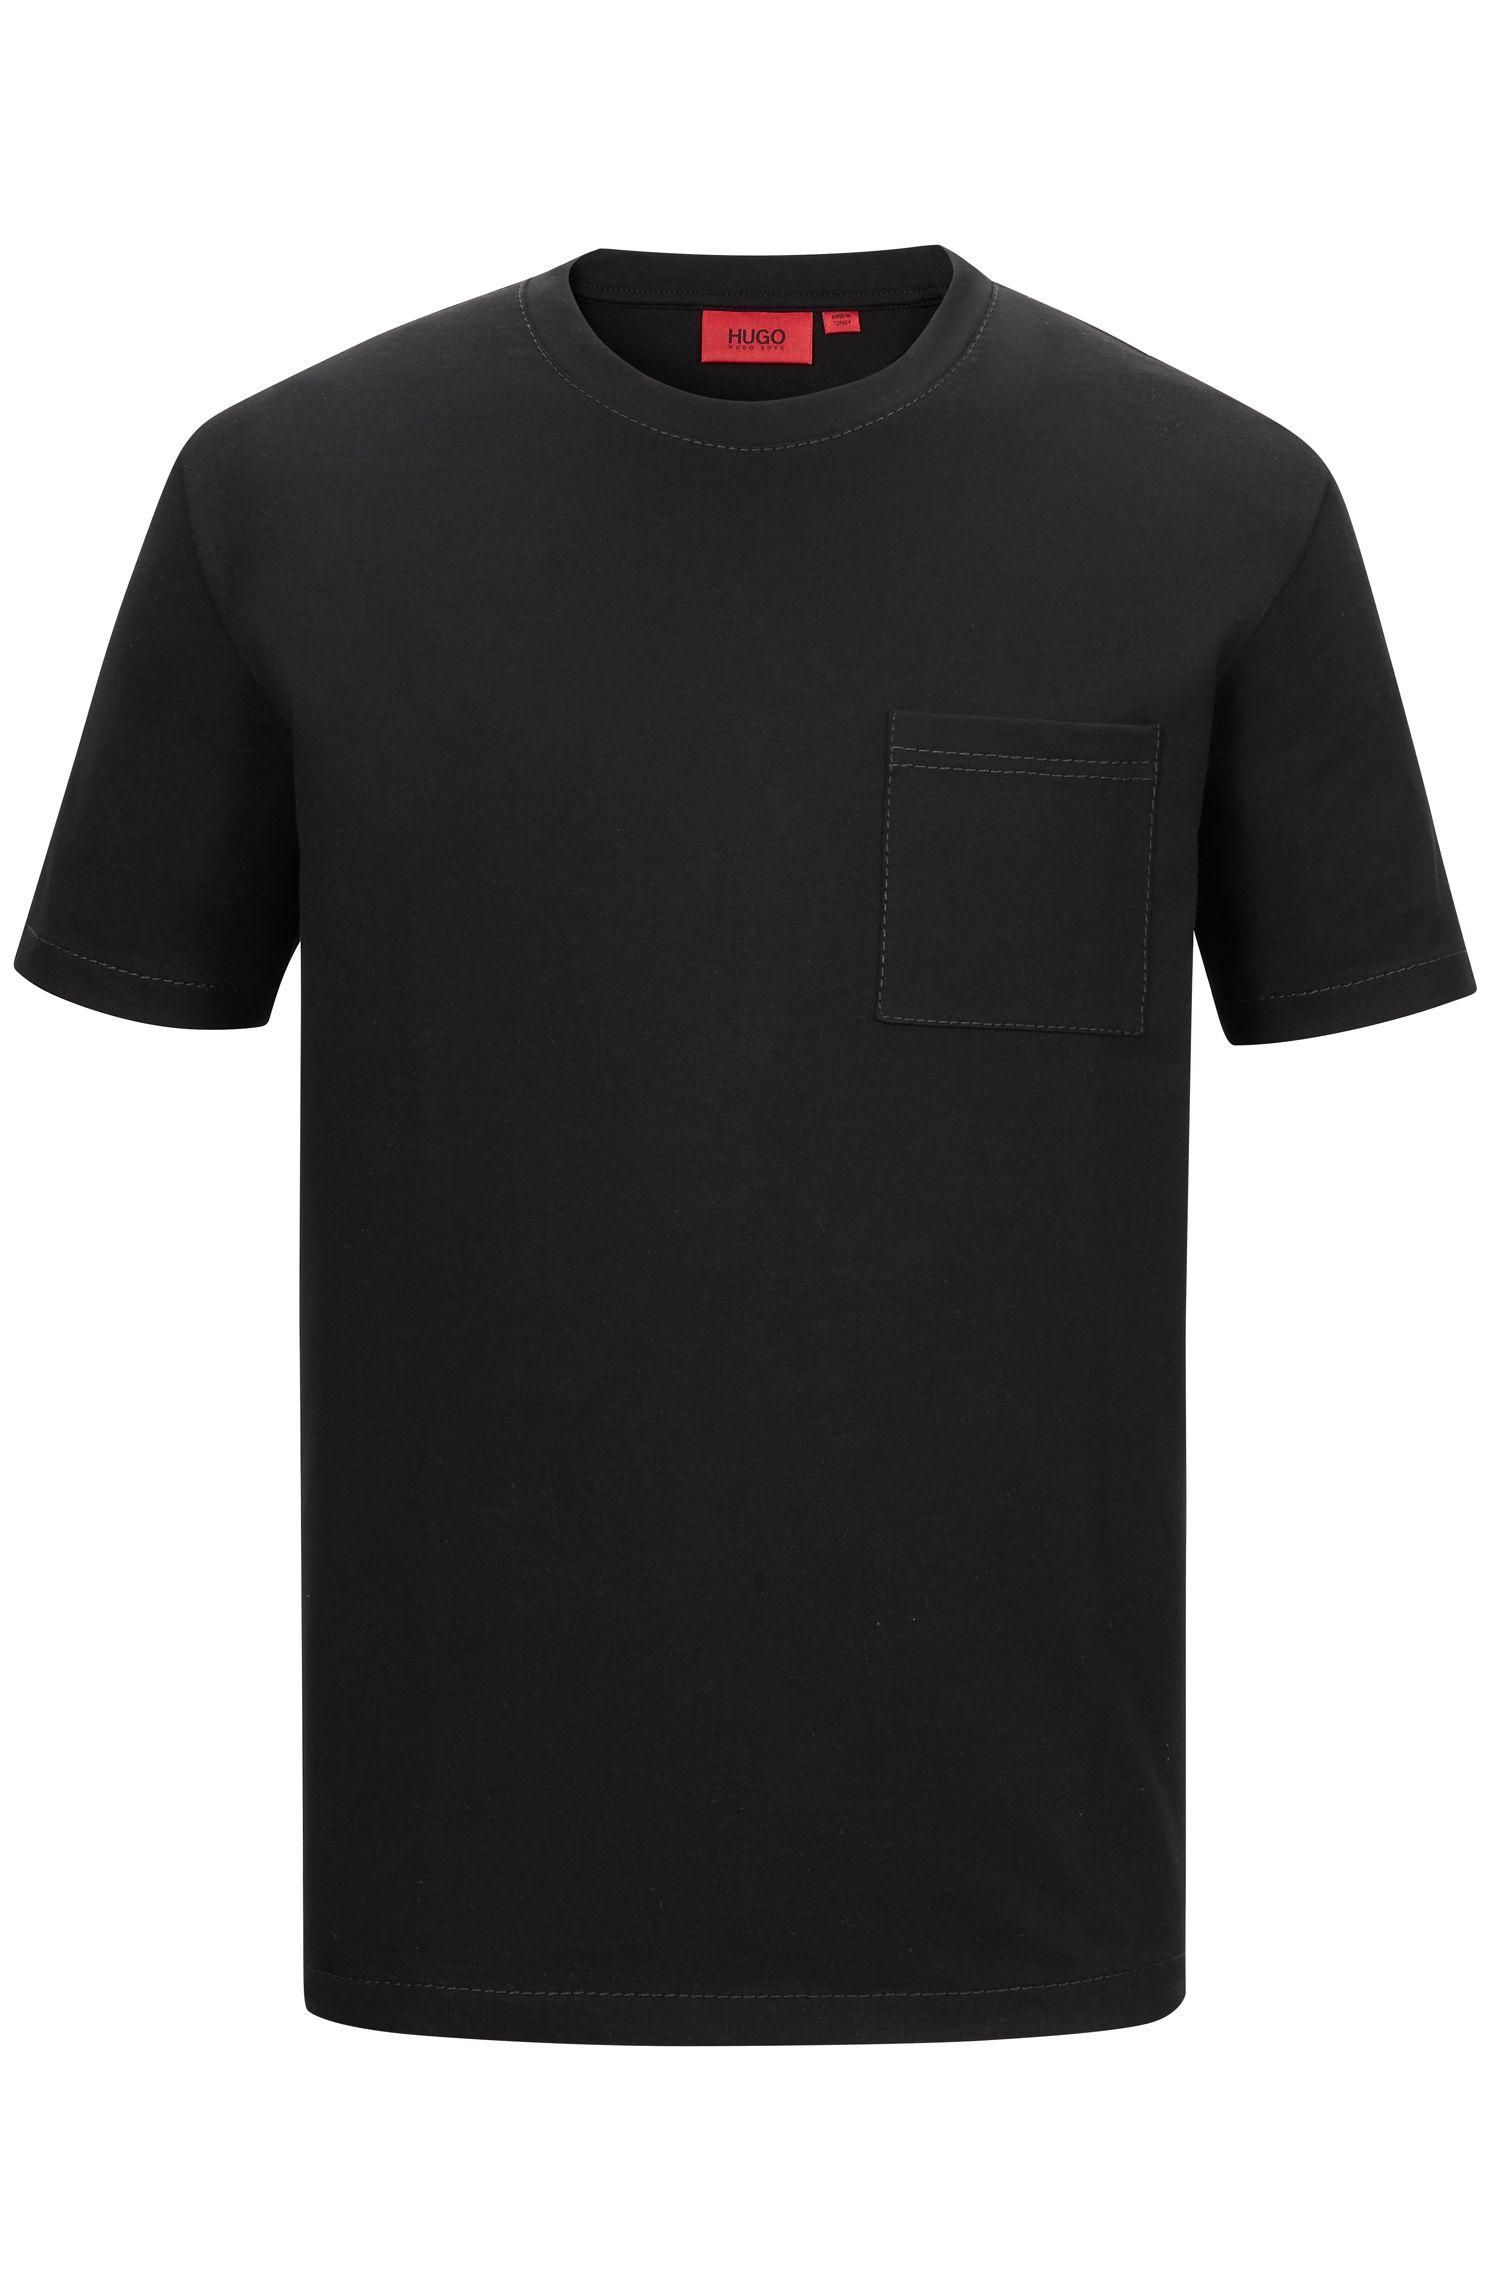 'Daccor' | Stretch French Terry Pocket T-Shirt